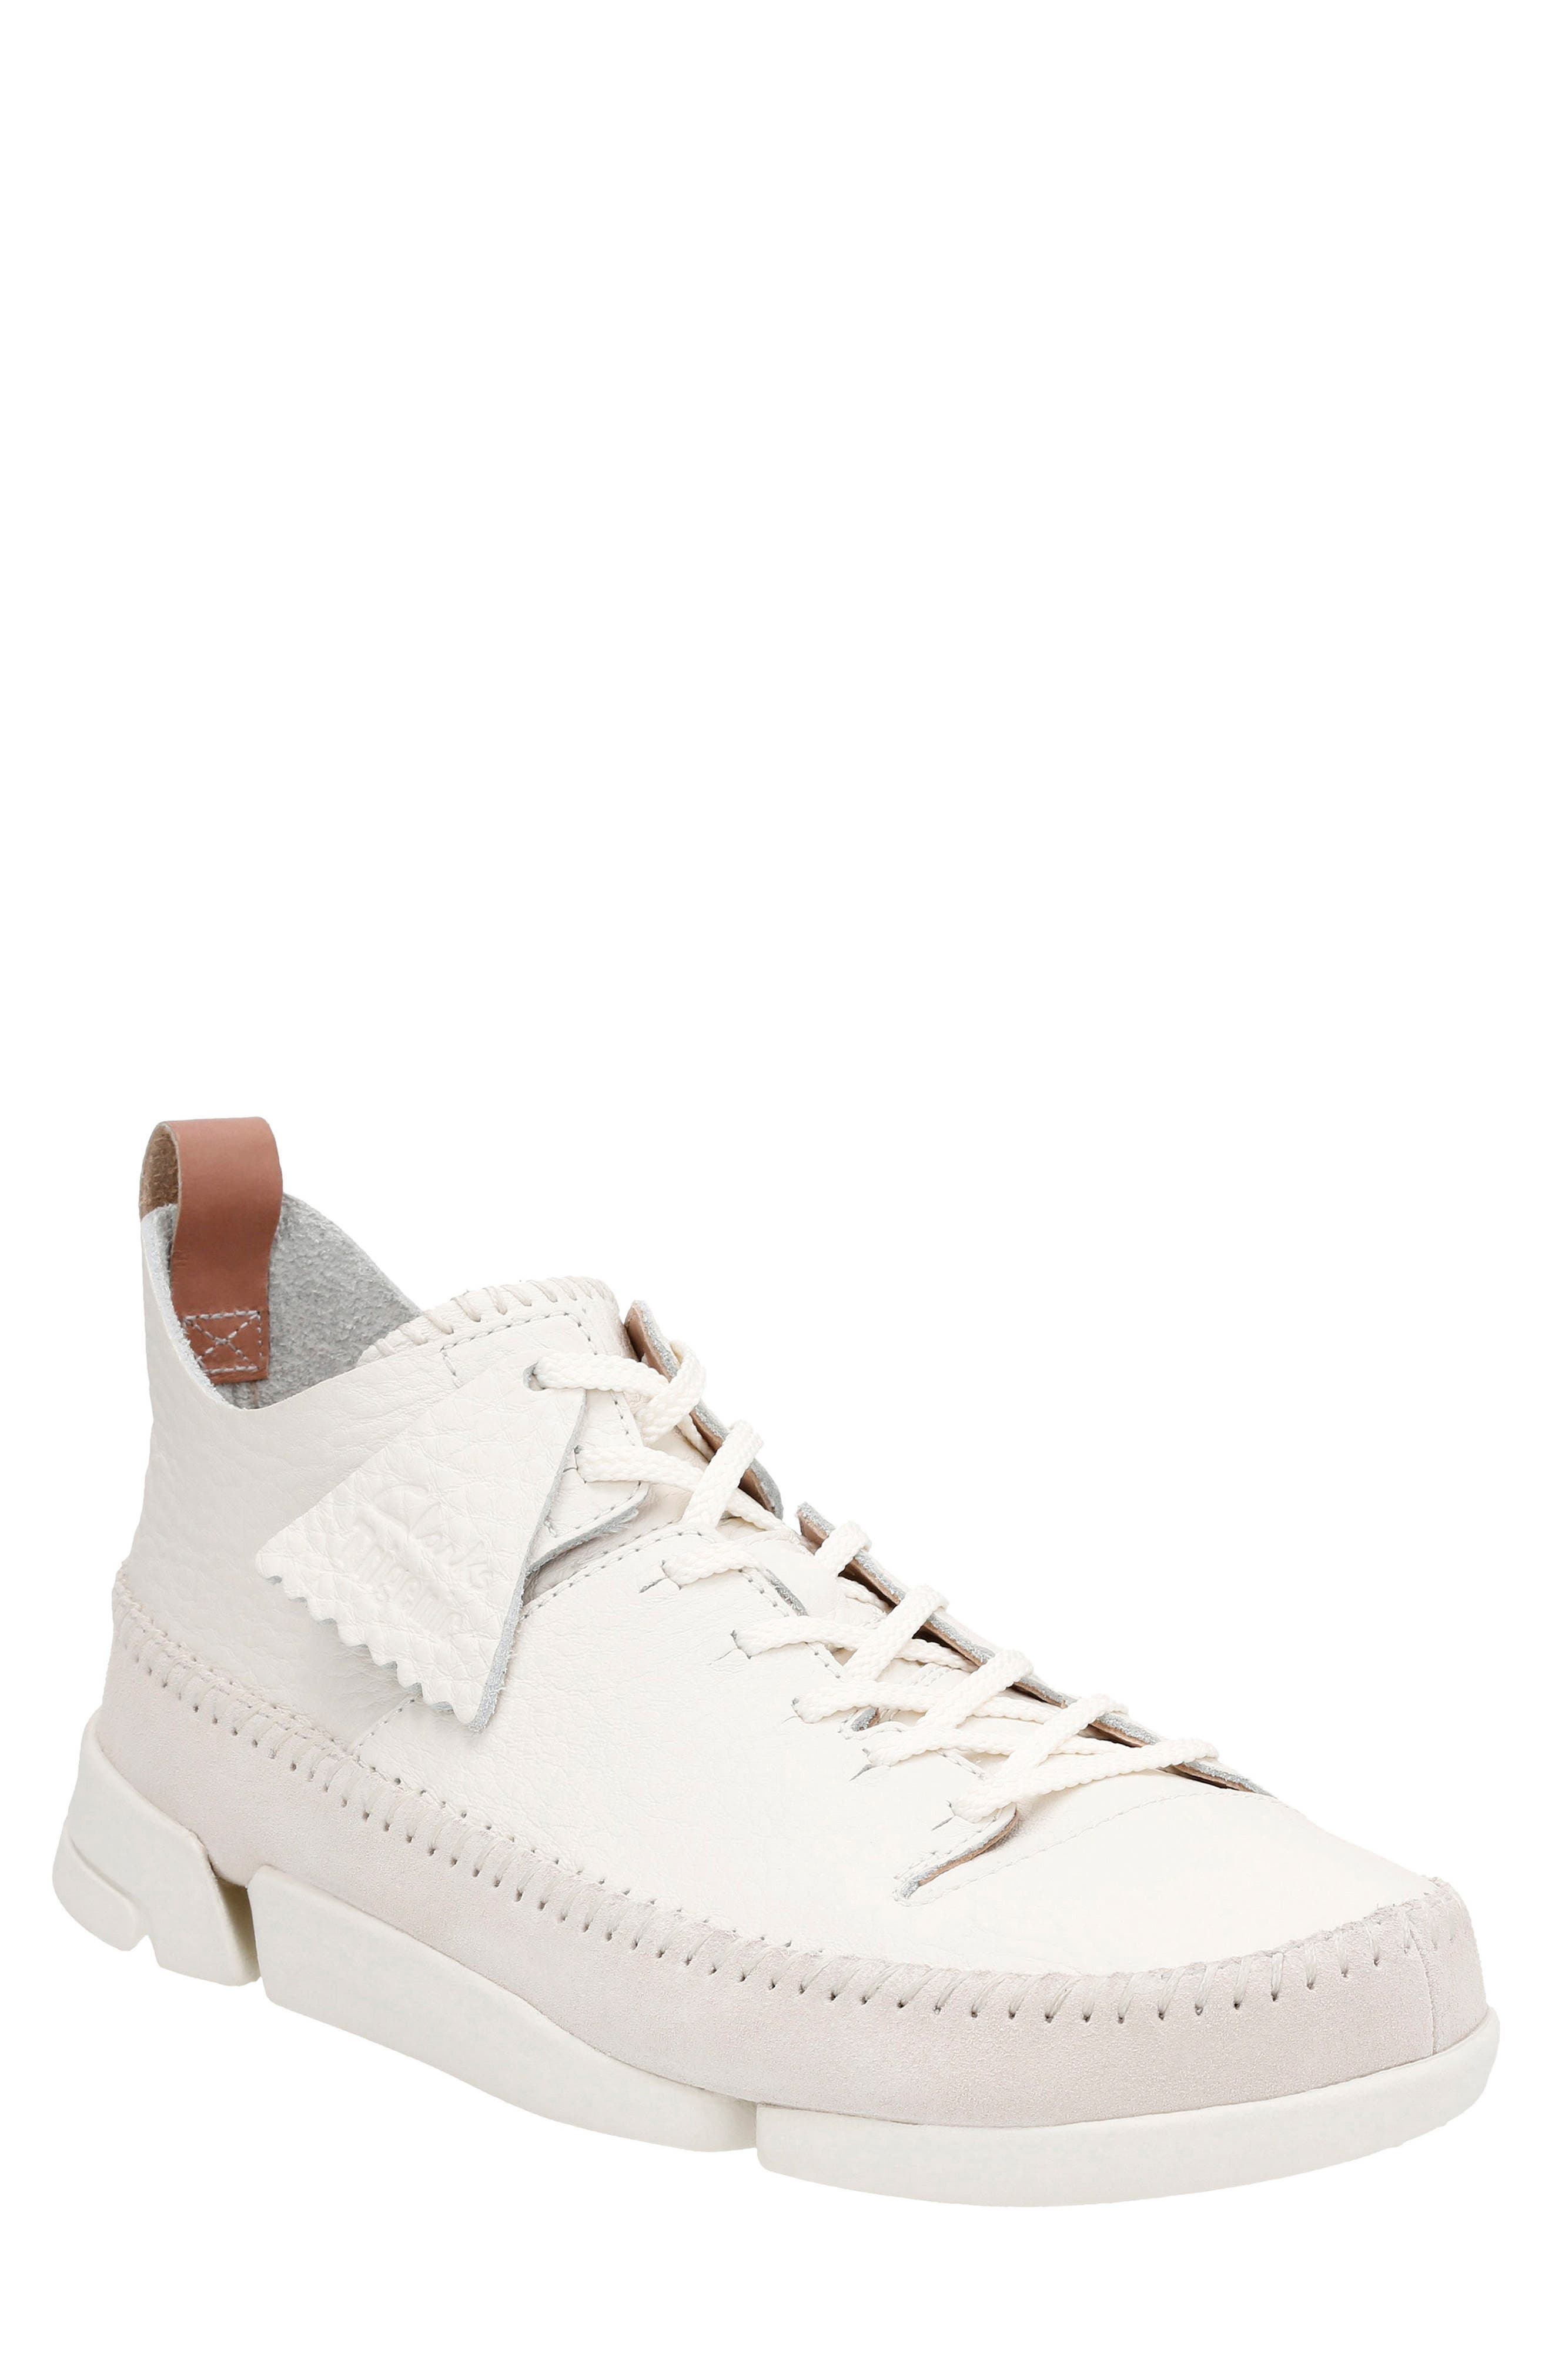 Alternate Image 1 Selected - Clarks® 'Trigenic Flex' Leather Sneaker (Men)